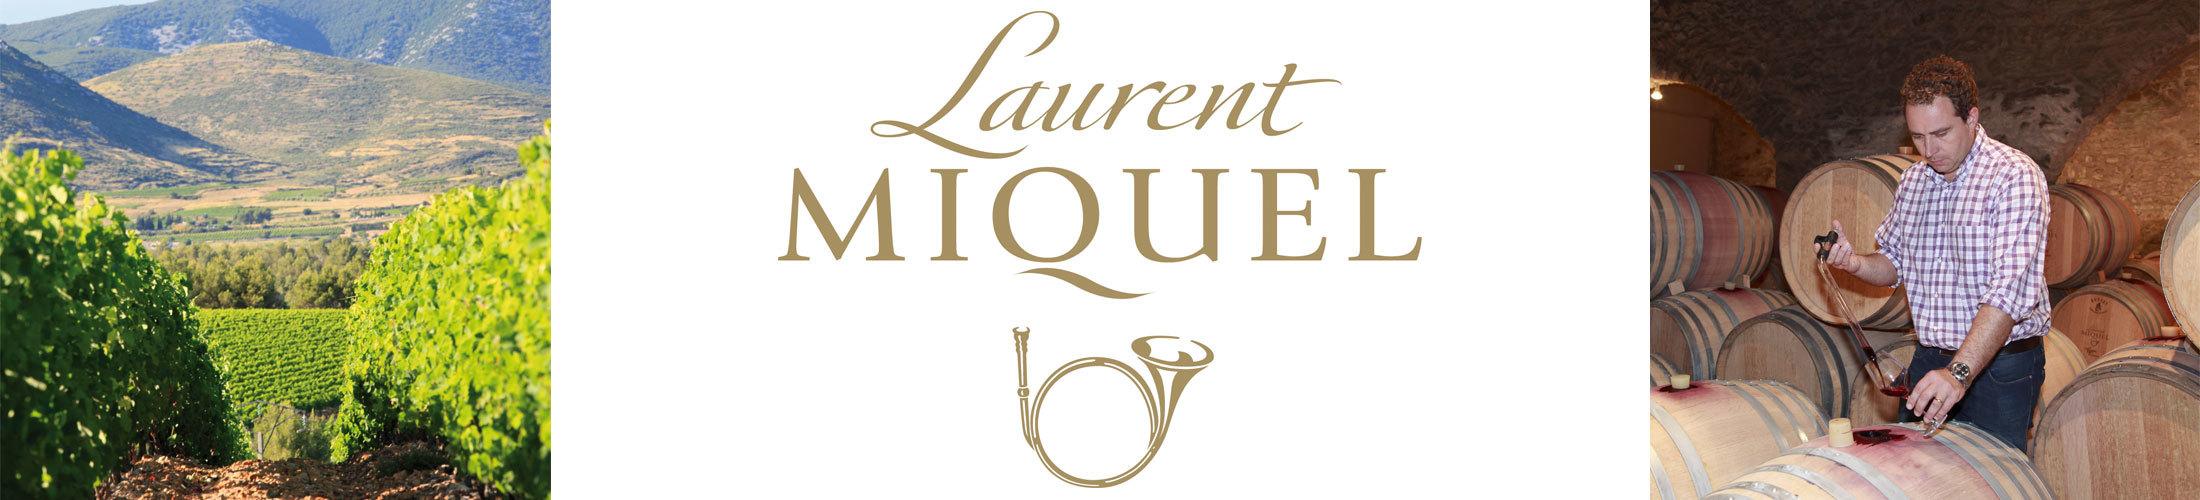 Laurent Miquel 1